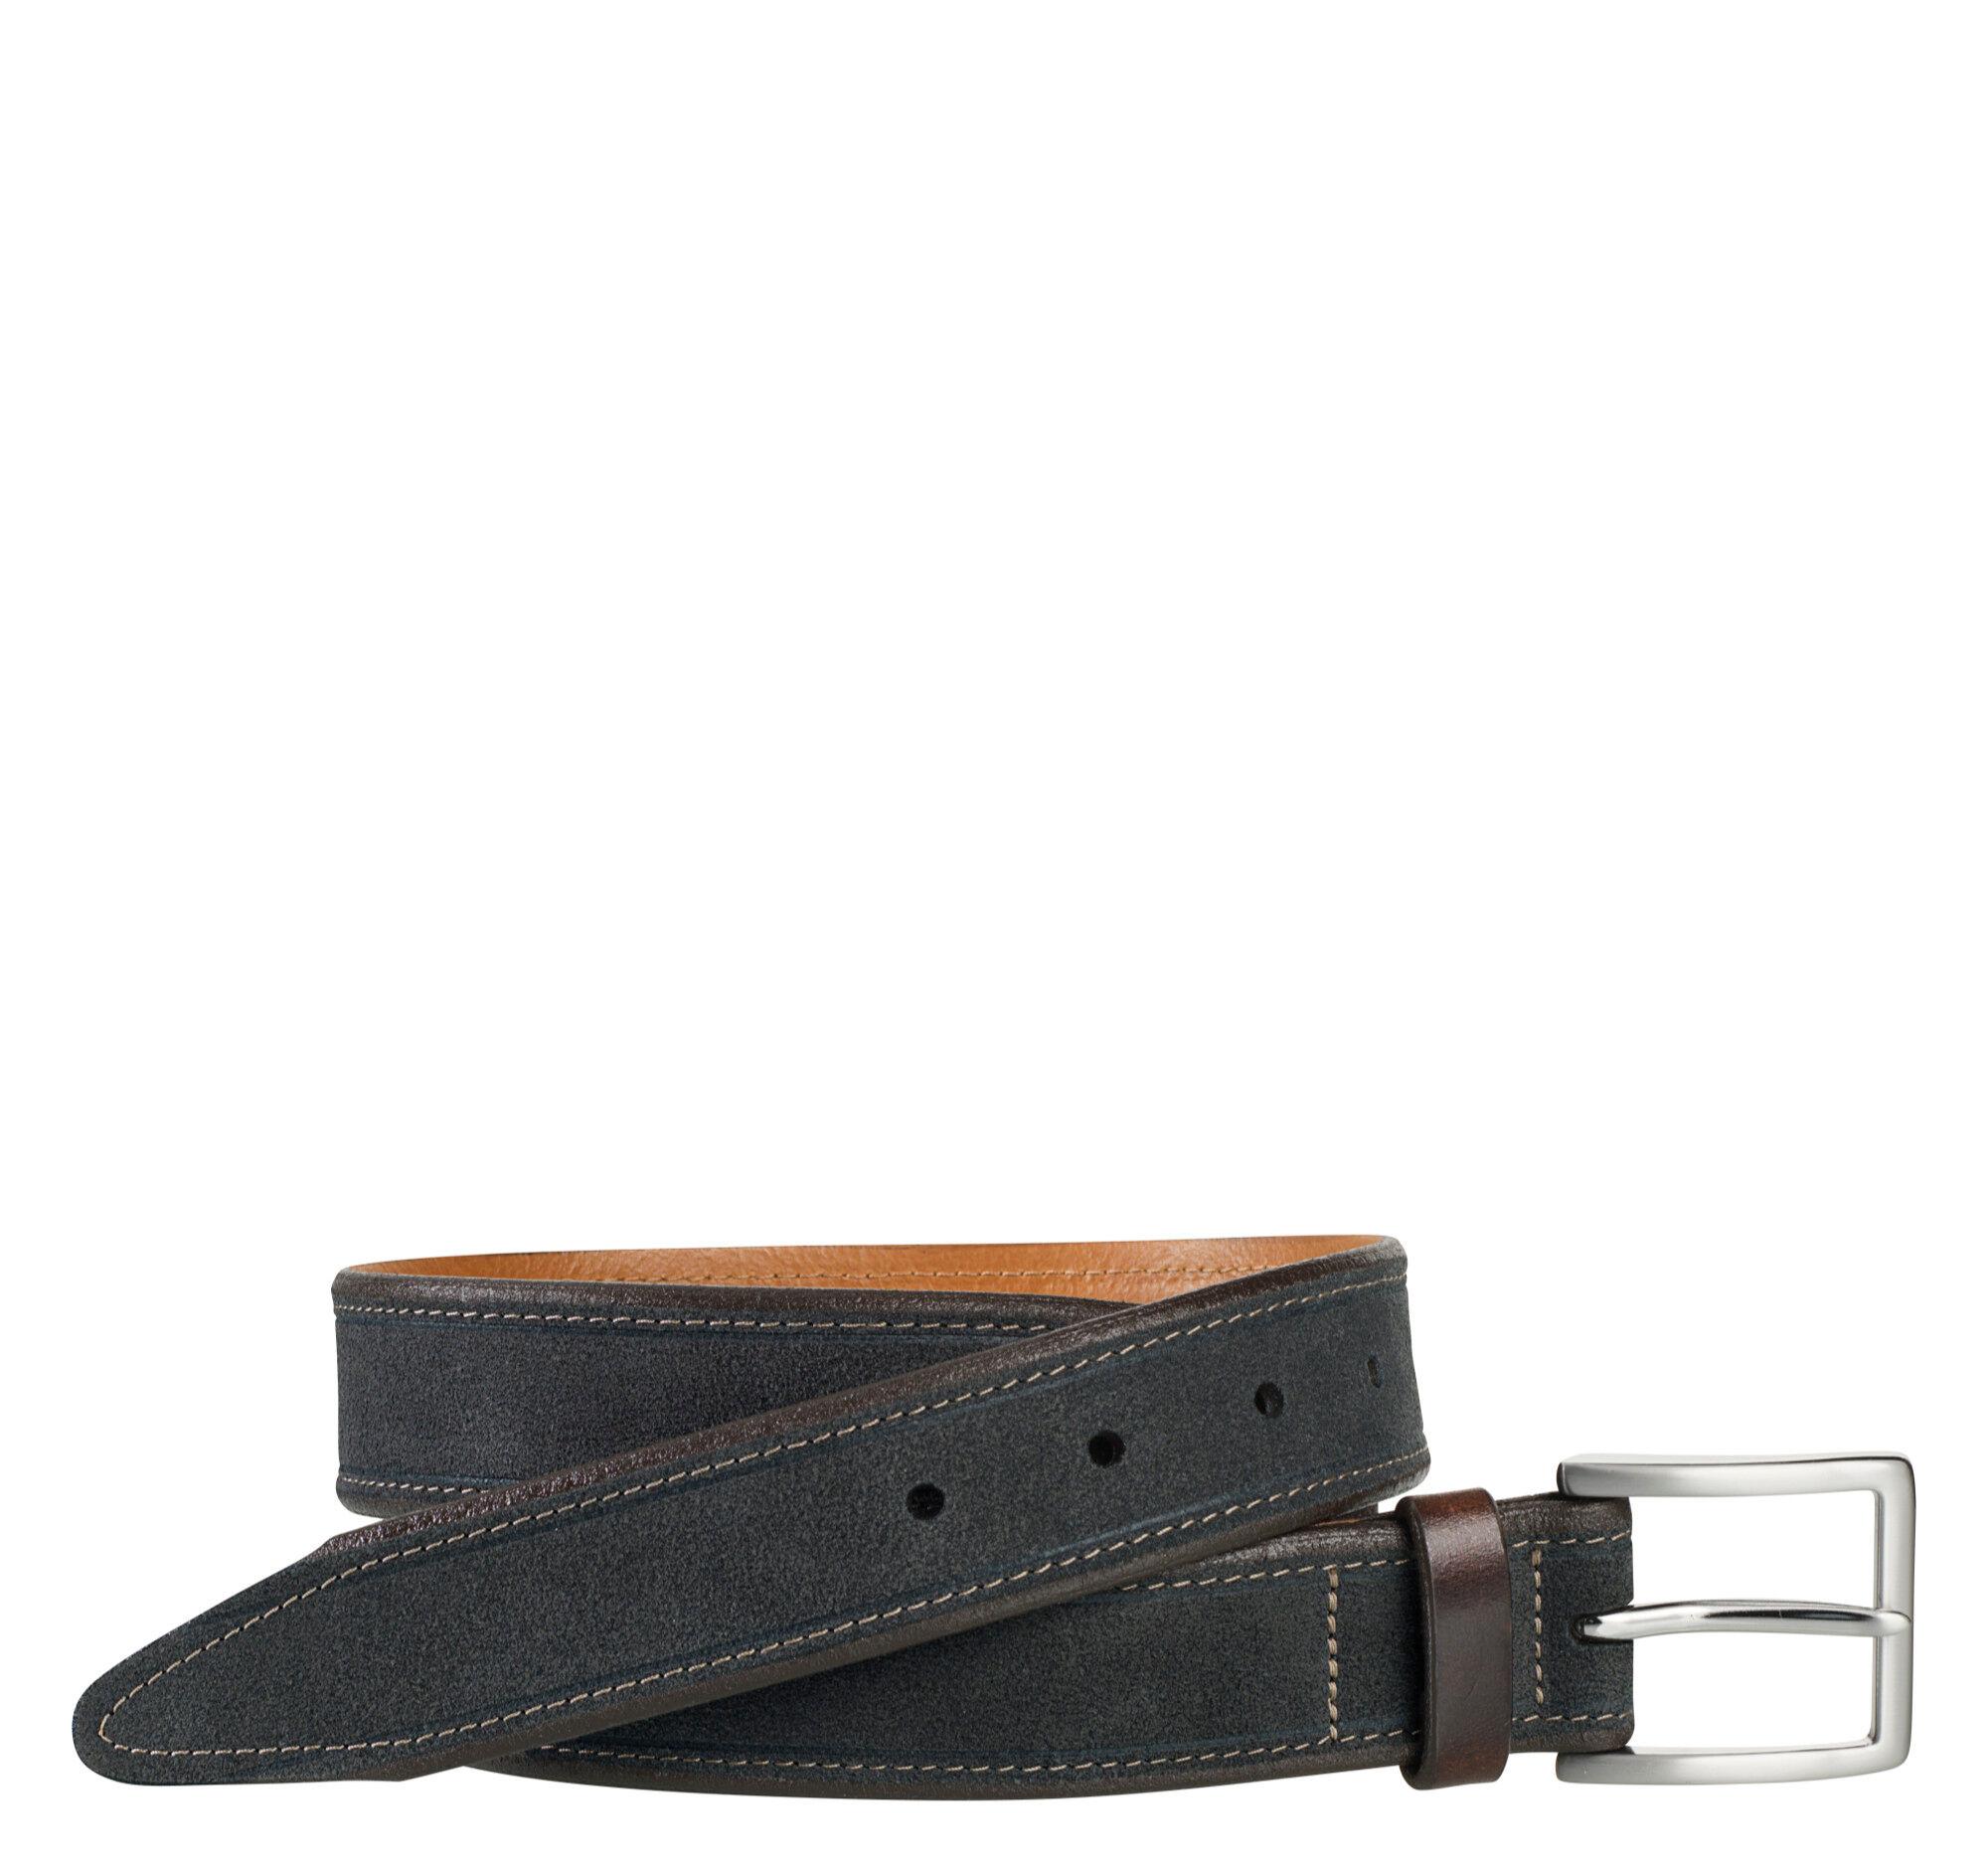 Johnston & Murphy Men's Stitched Suede Belt - Navy Suede - Size 44